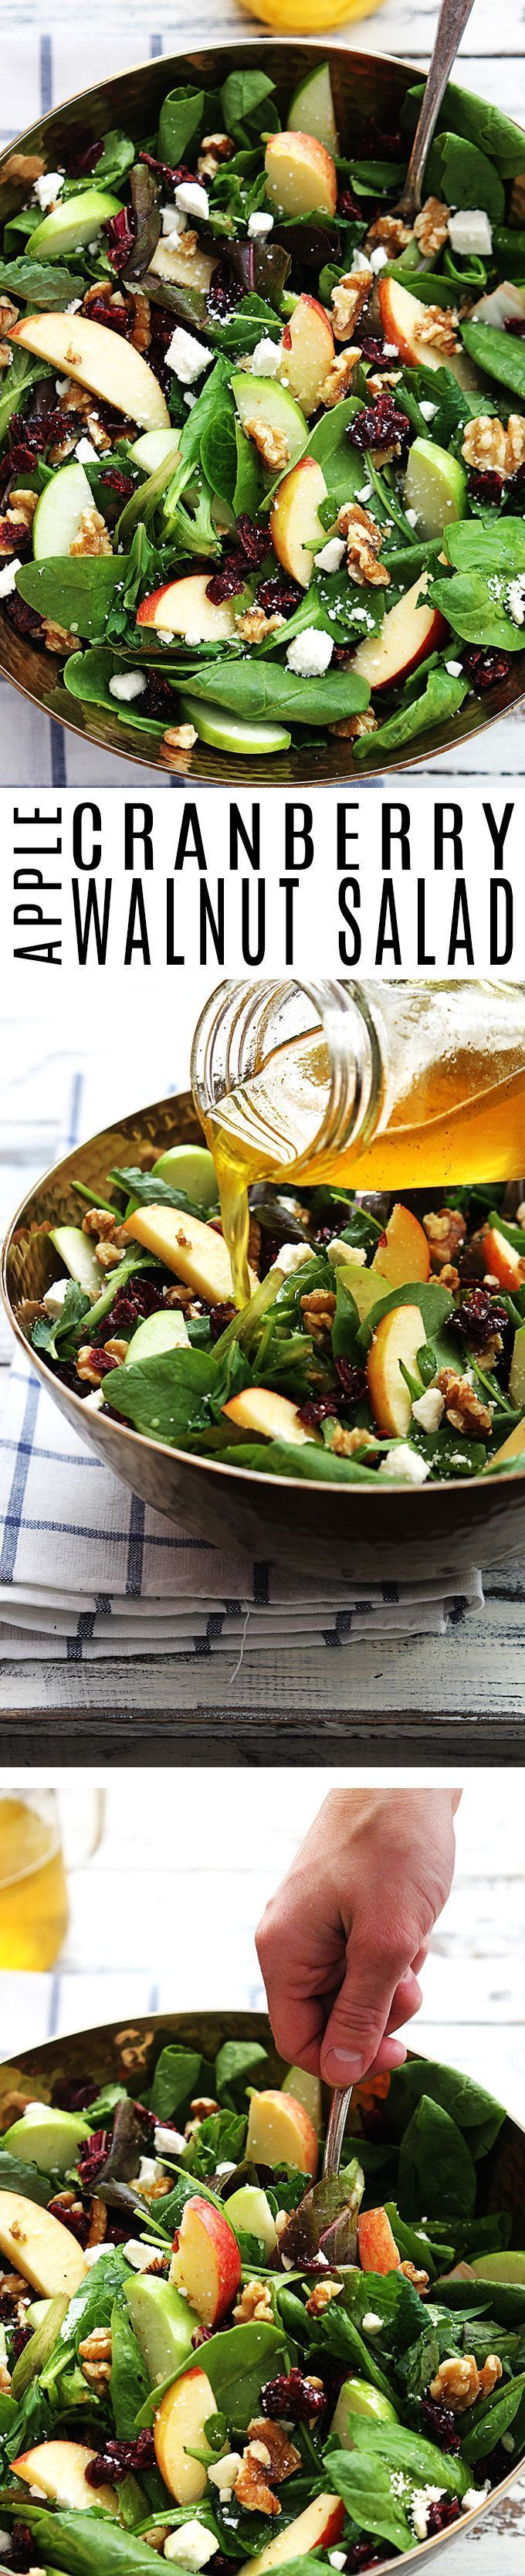 Crisp Apples, Dried Cranberries, Feta Cheese, and Hearty Walnuts Make the Perfect  Fall salad #fallrecipes #salad #easymeals